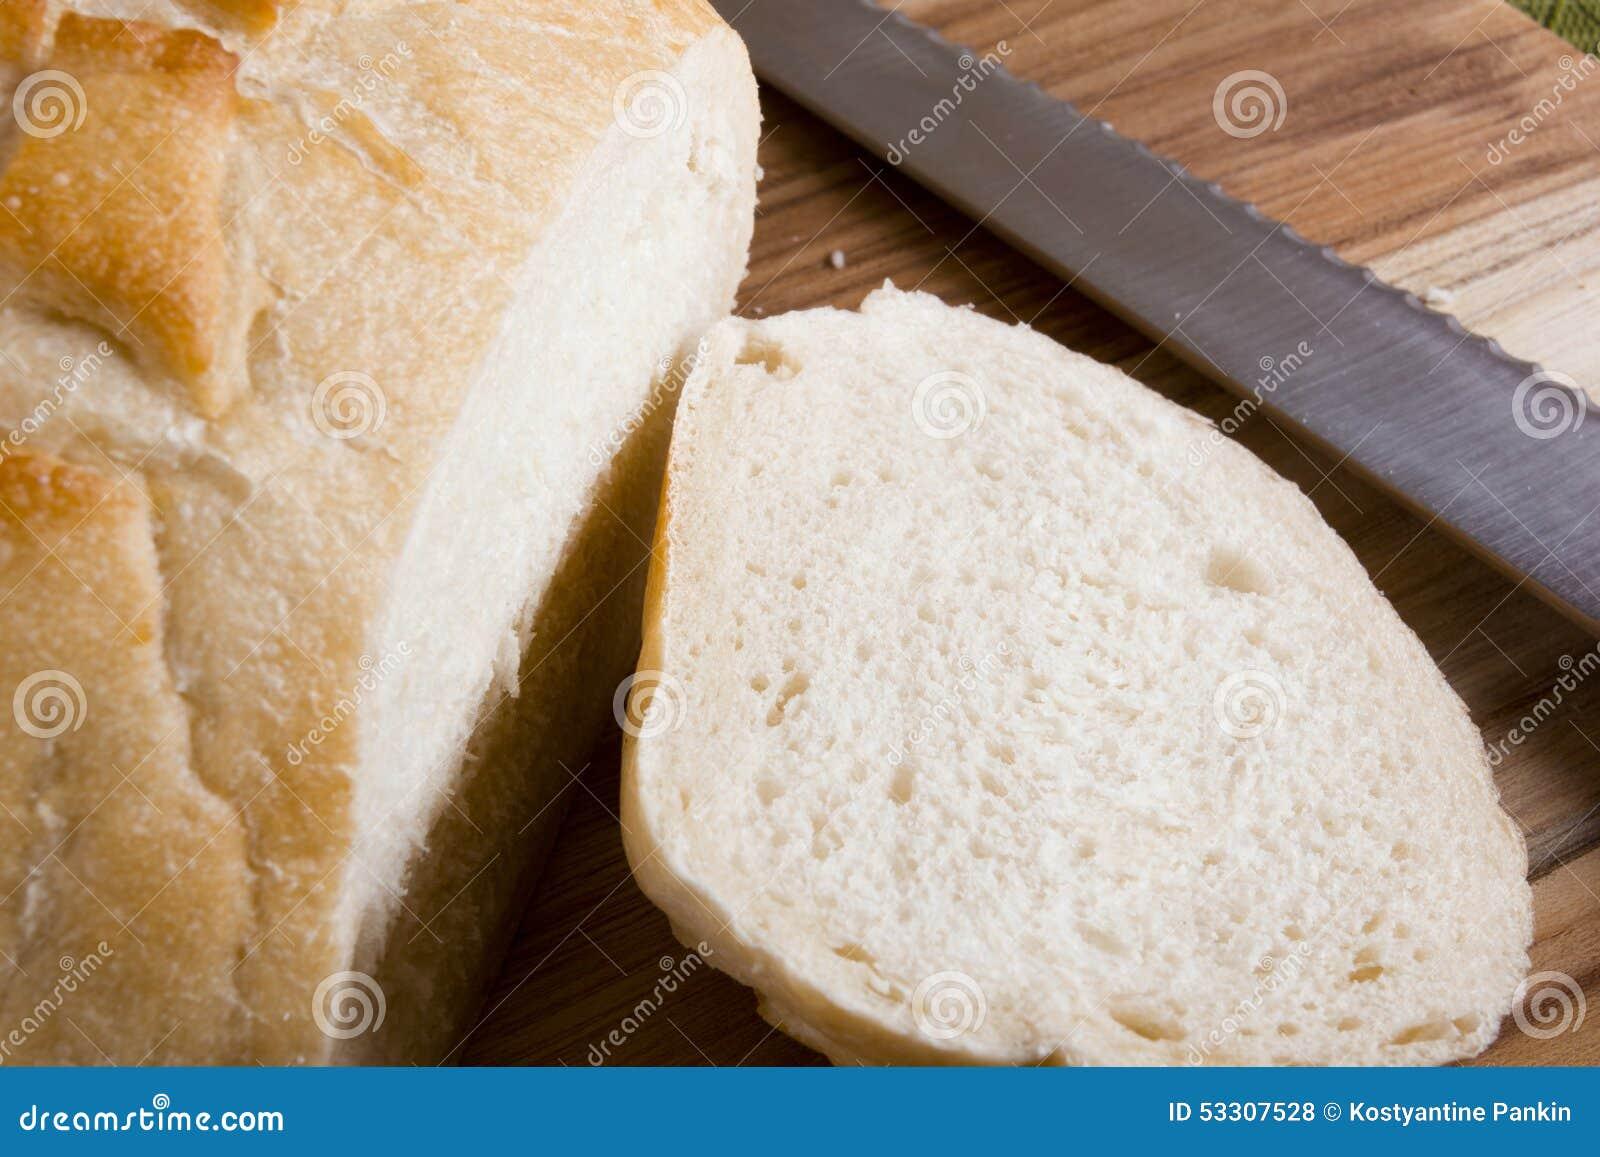 White Bread Stock Photo - Image: 53307528